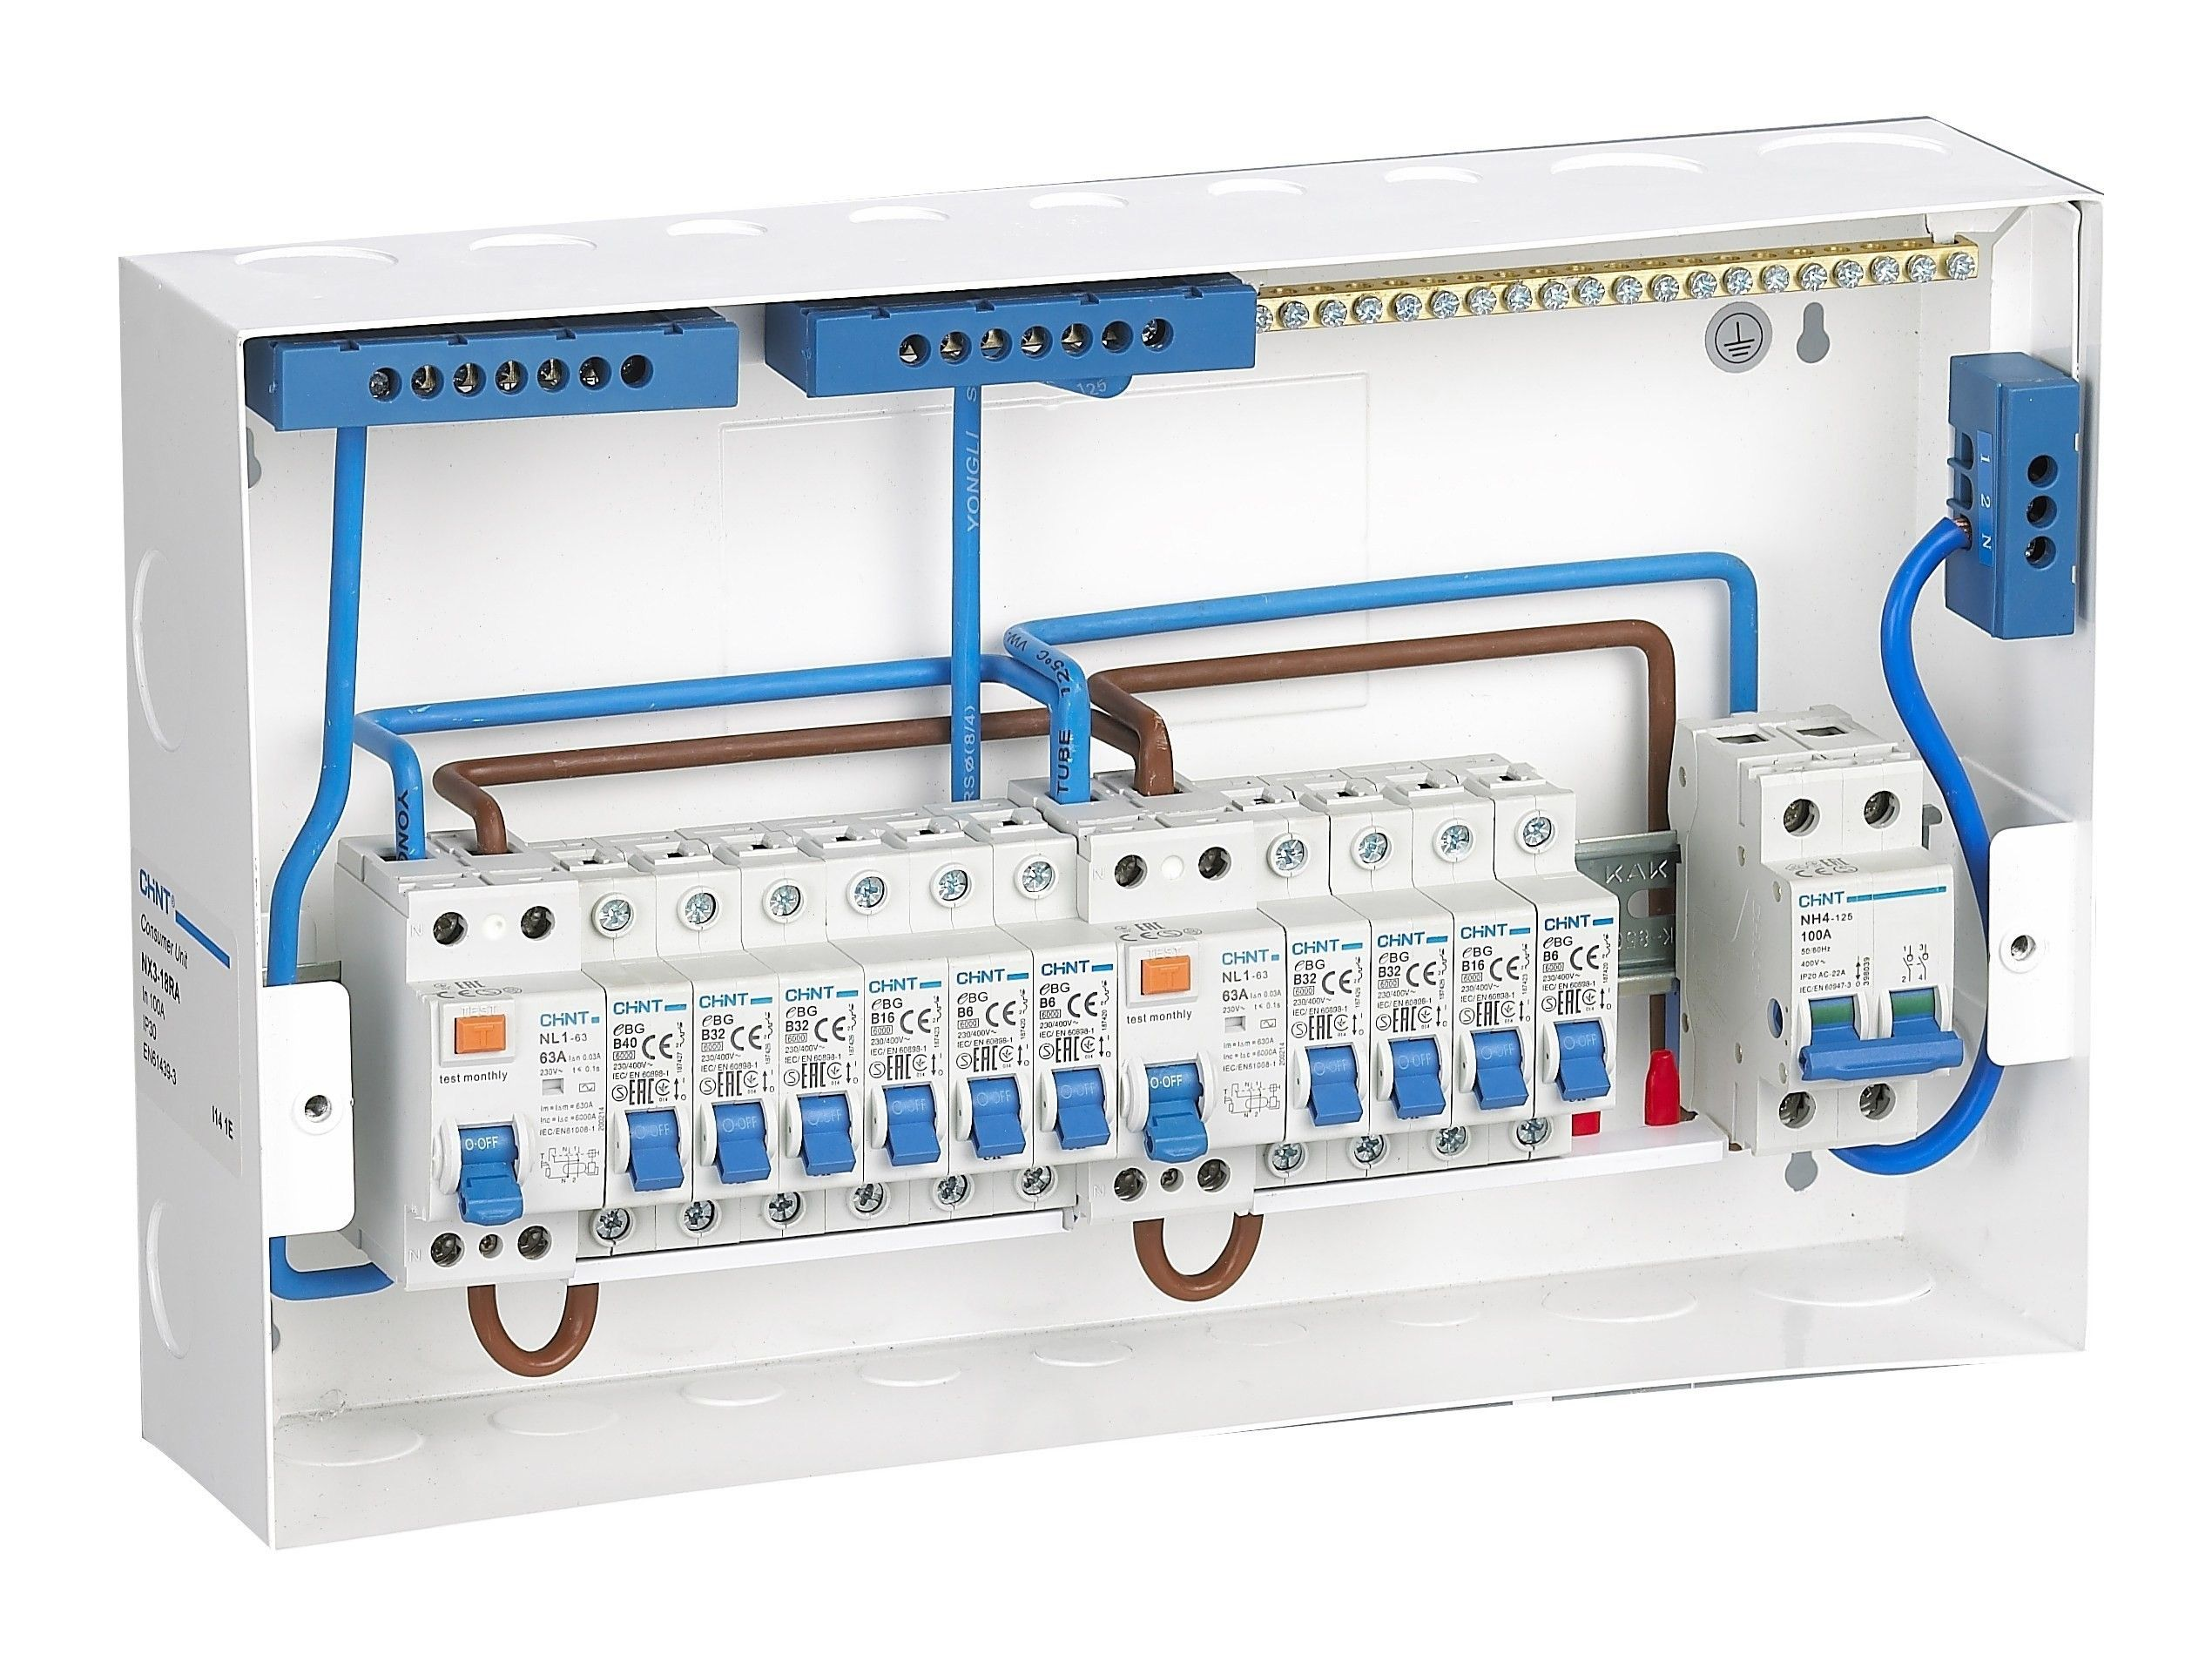 Rcbo Consumer Unit Wiring Diagram Diagram Diagramtemplate Diagramsample Eletrica Residencial Parte Eletrica Eletricista